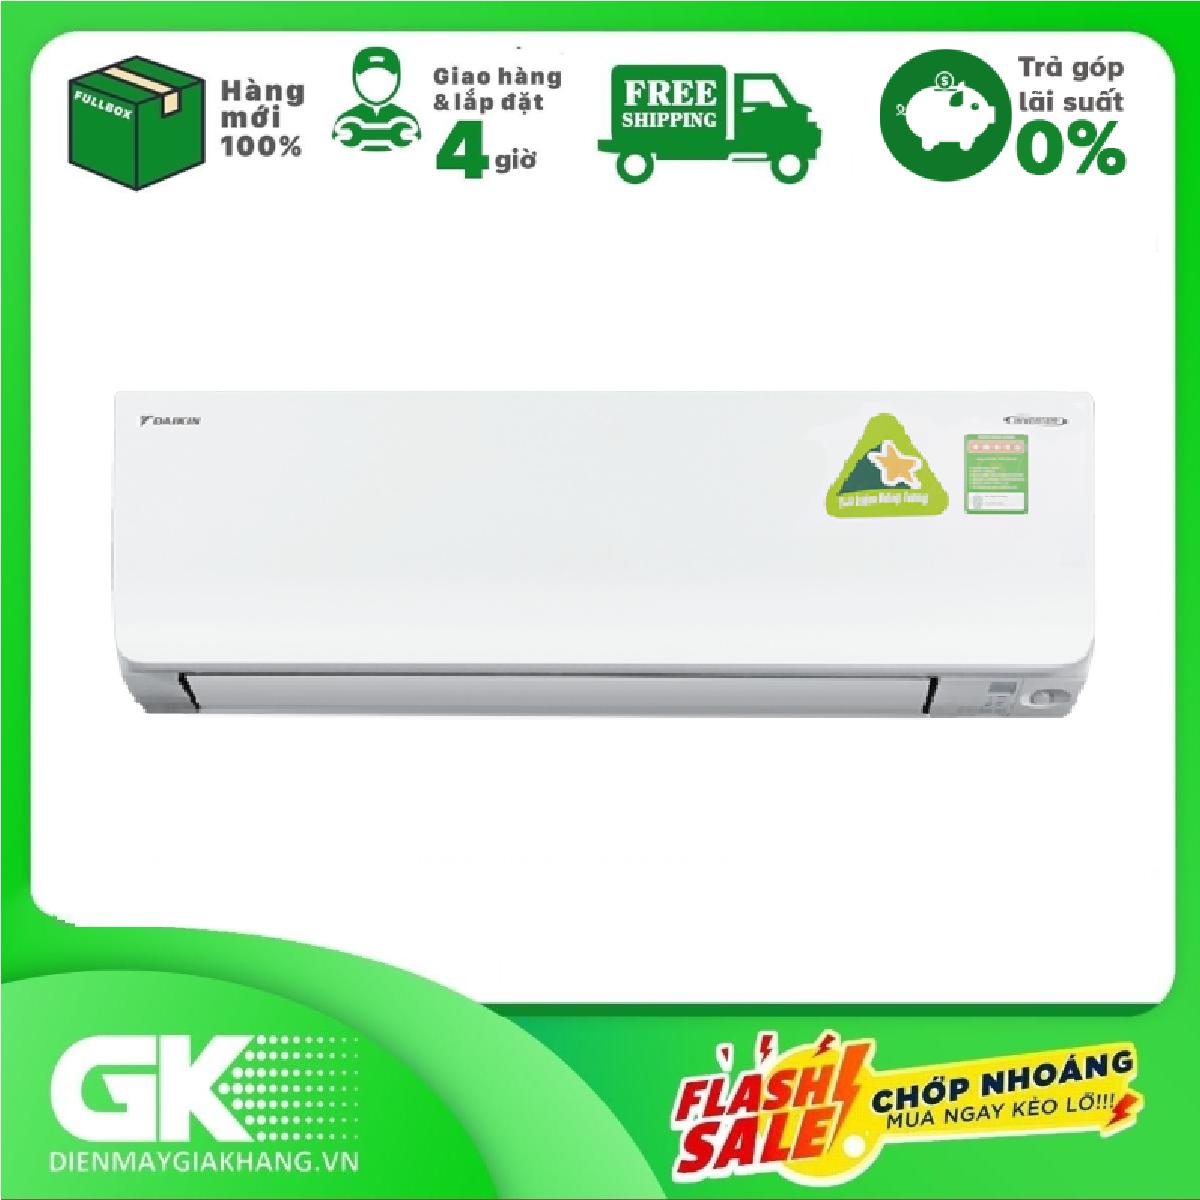 TRẢ GÓP 0% – Máy lạnh Daikin Inverter 1 HP FTKM25SVMV